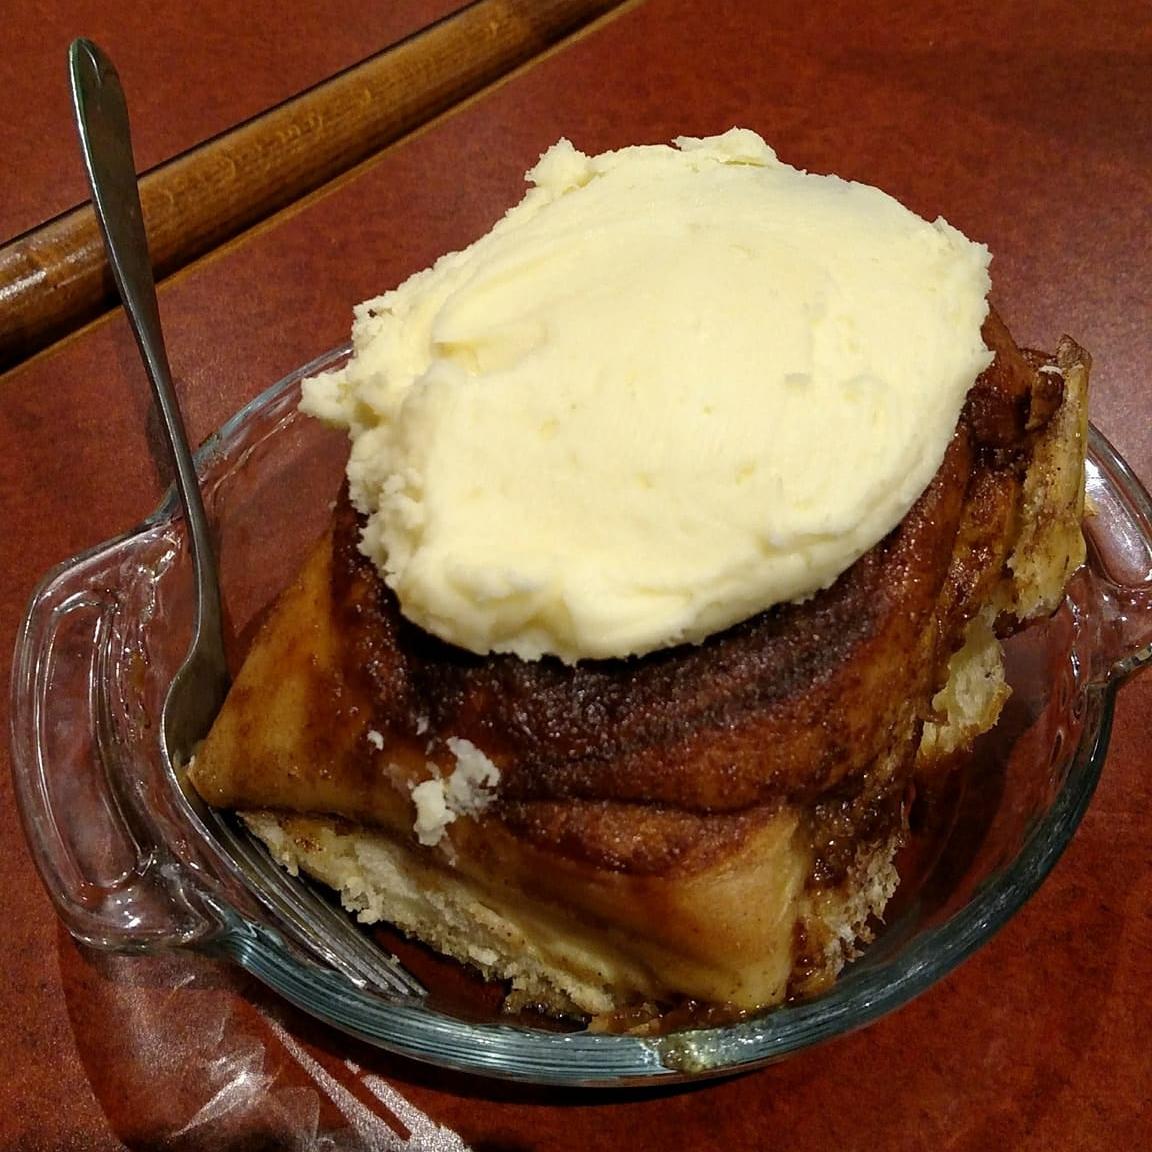 Grand Traverse Pie Co. East Lansing, MI